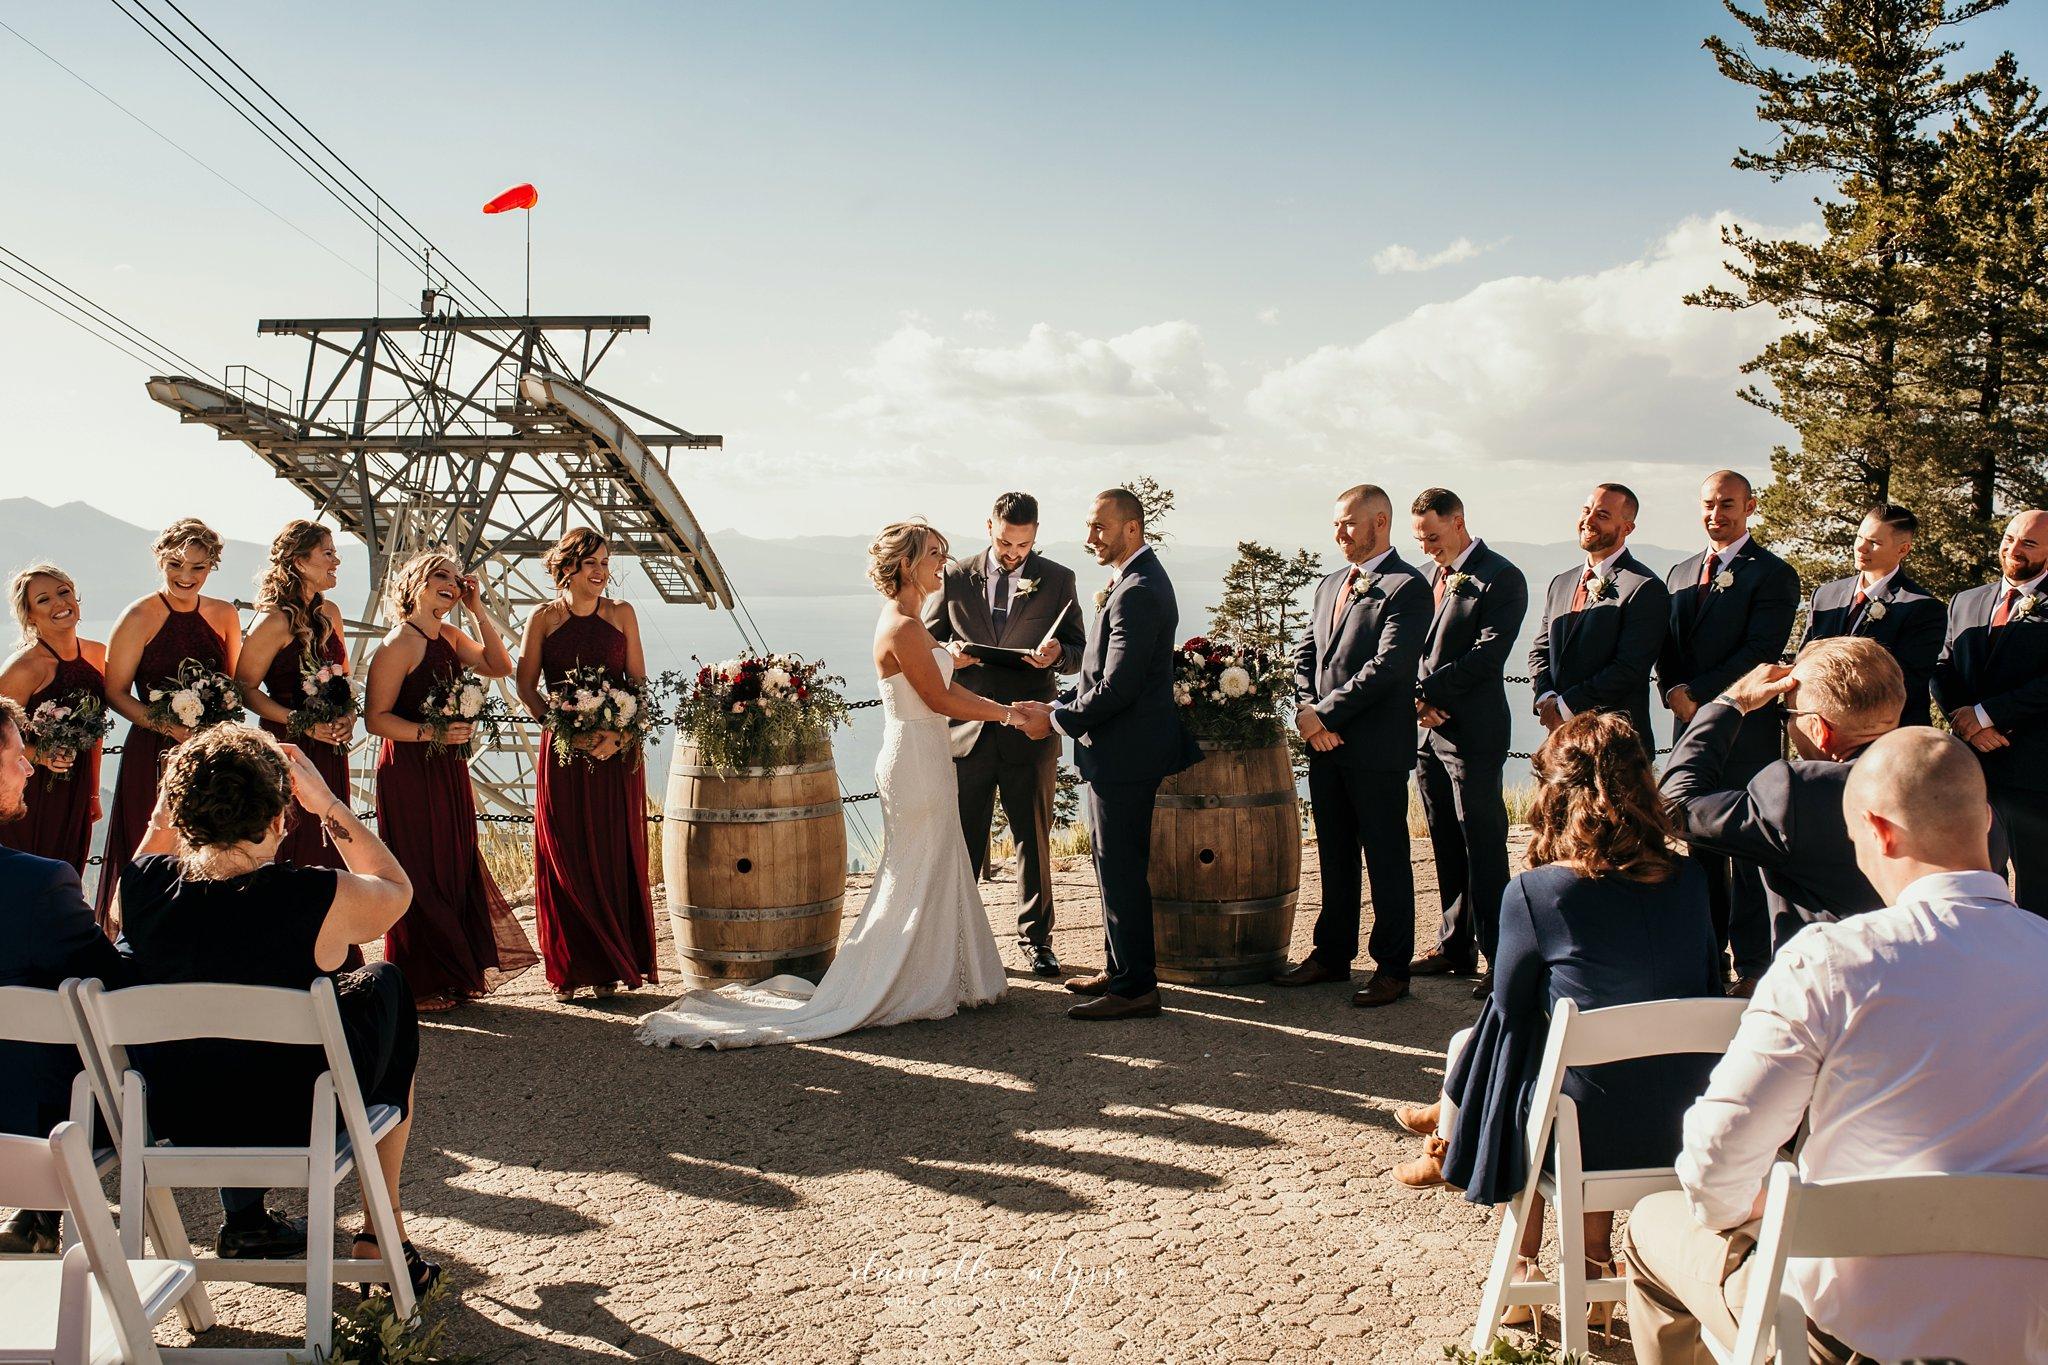 180831_wedding_stephanie_heavenly_south_lake_tahoe_danielle_alysse_photography_destination_blog_725_WEB.jpg